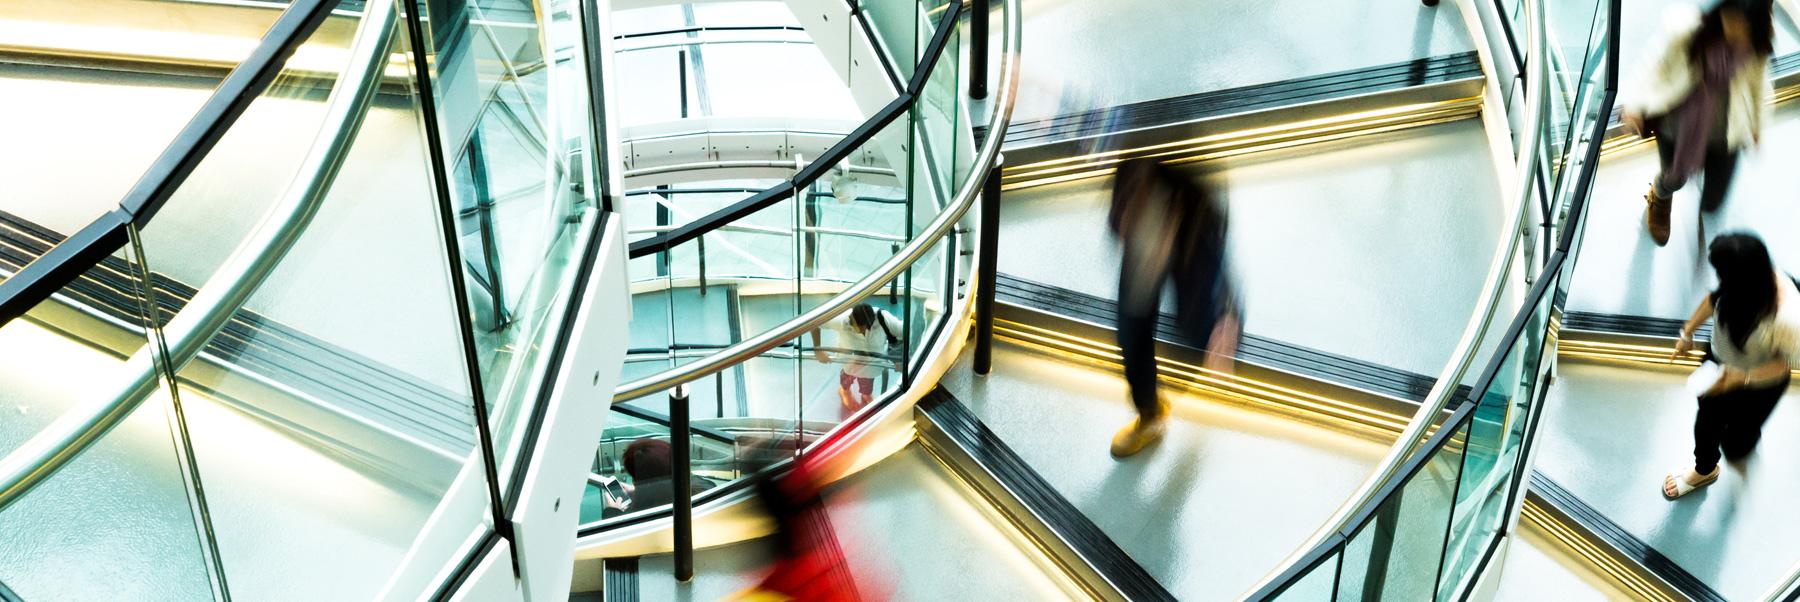 employment law | flichy grangé avocats